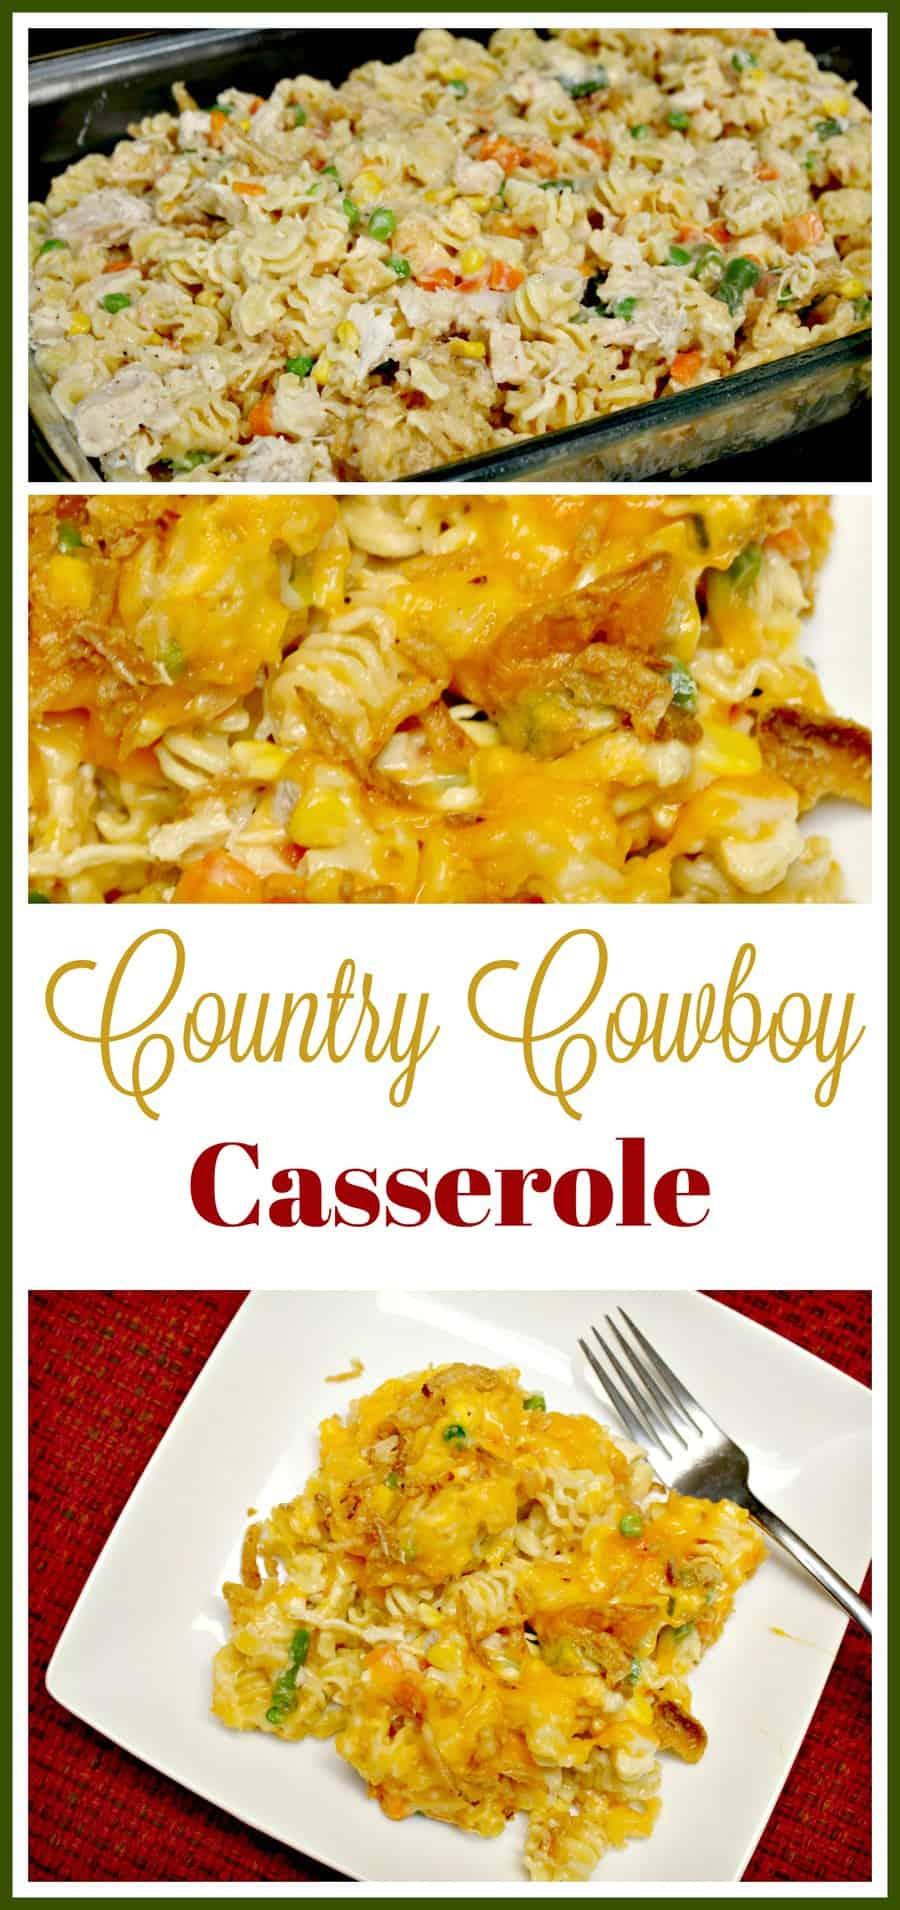 Country Cowboy Casserole Hotdish